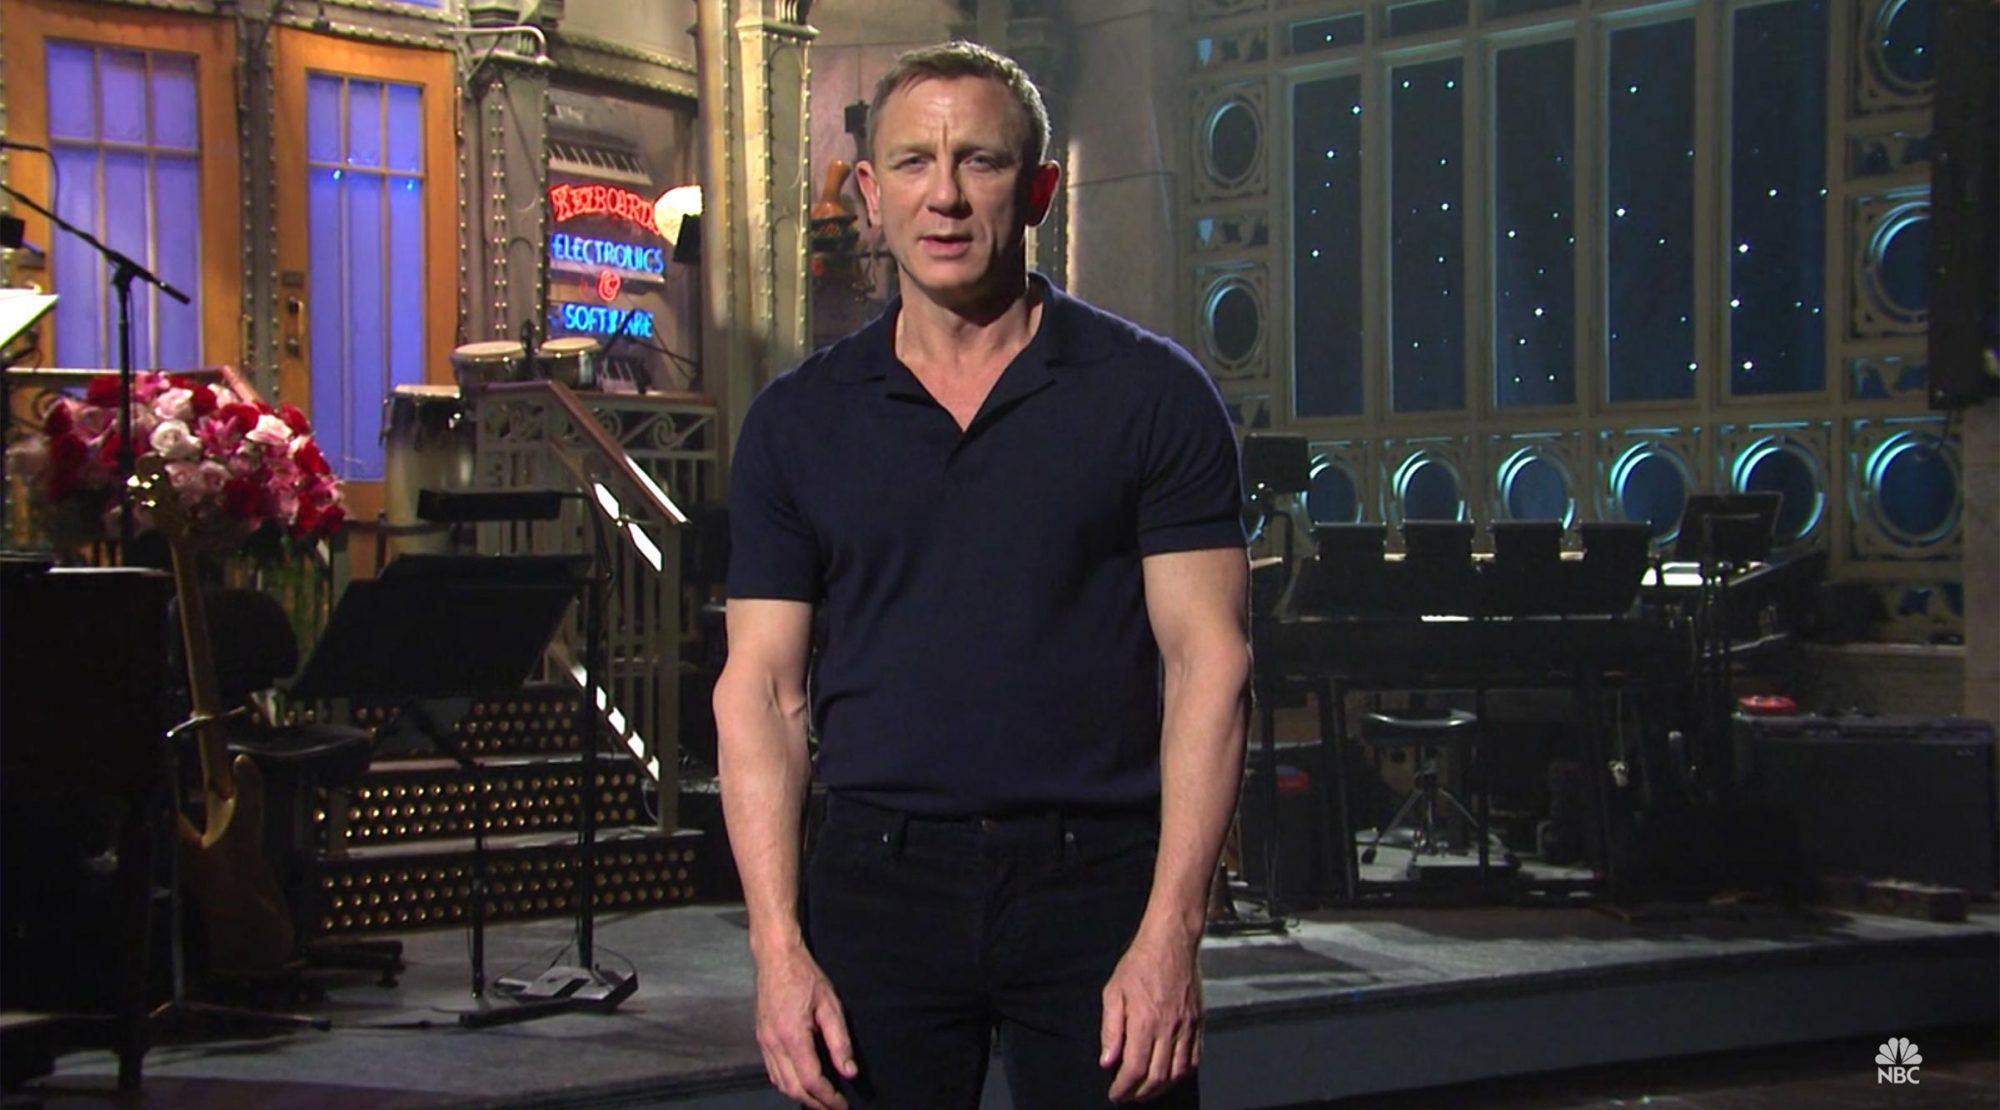 Daniel Craig hosting Saturday Night Live